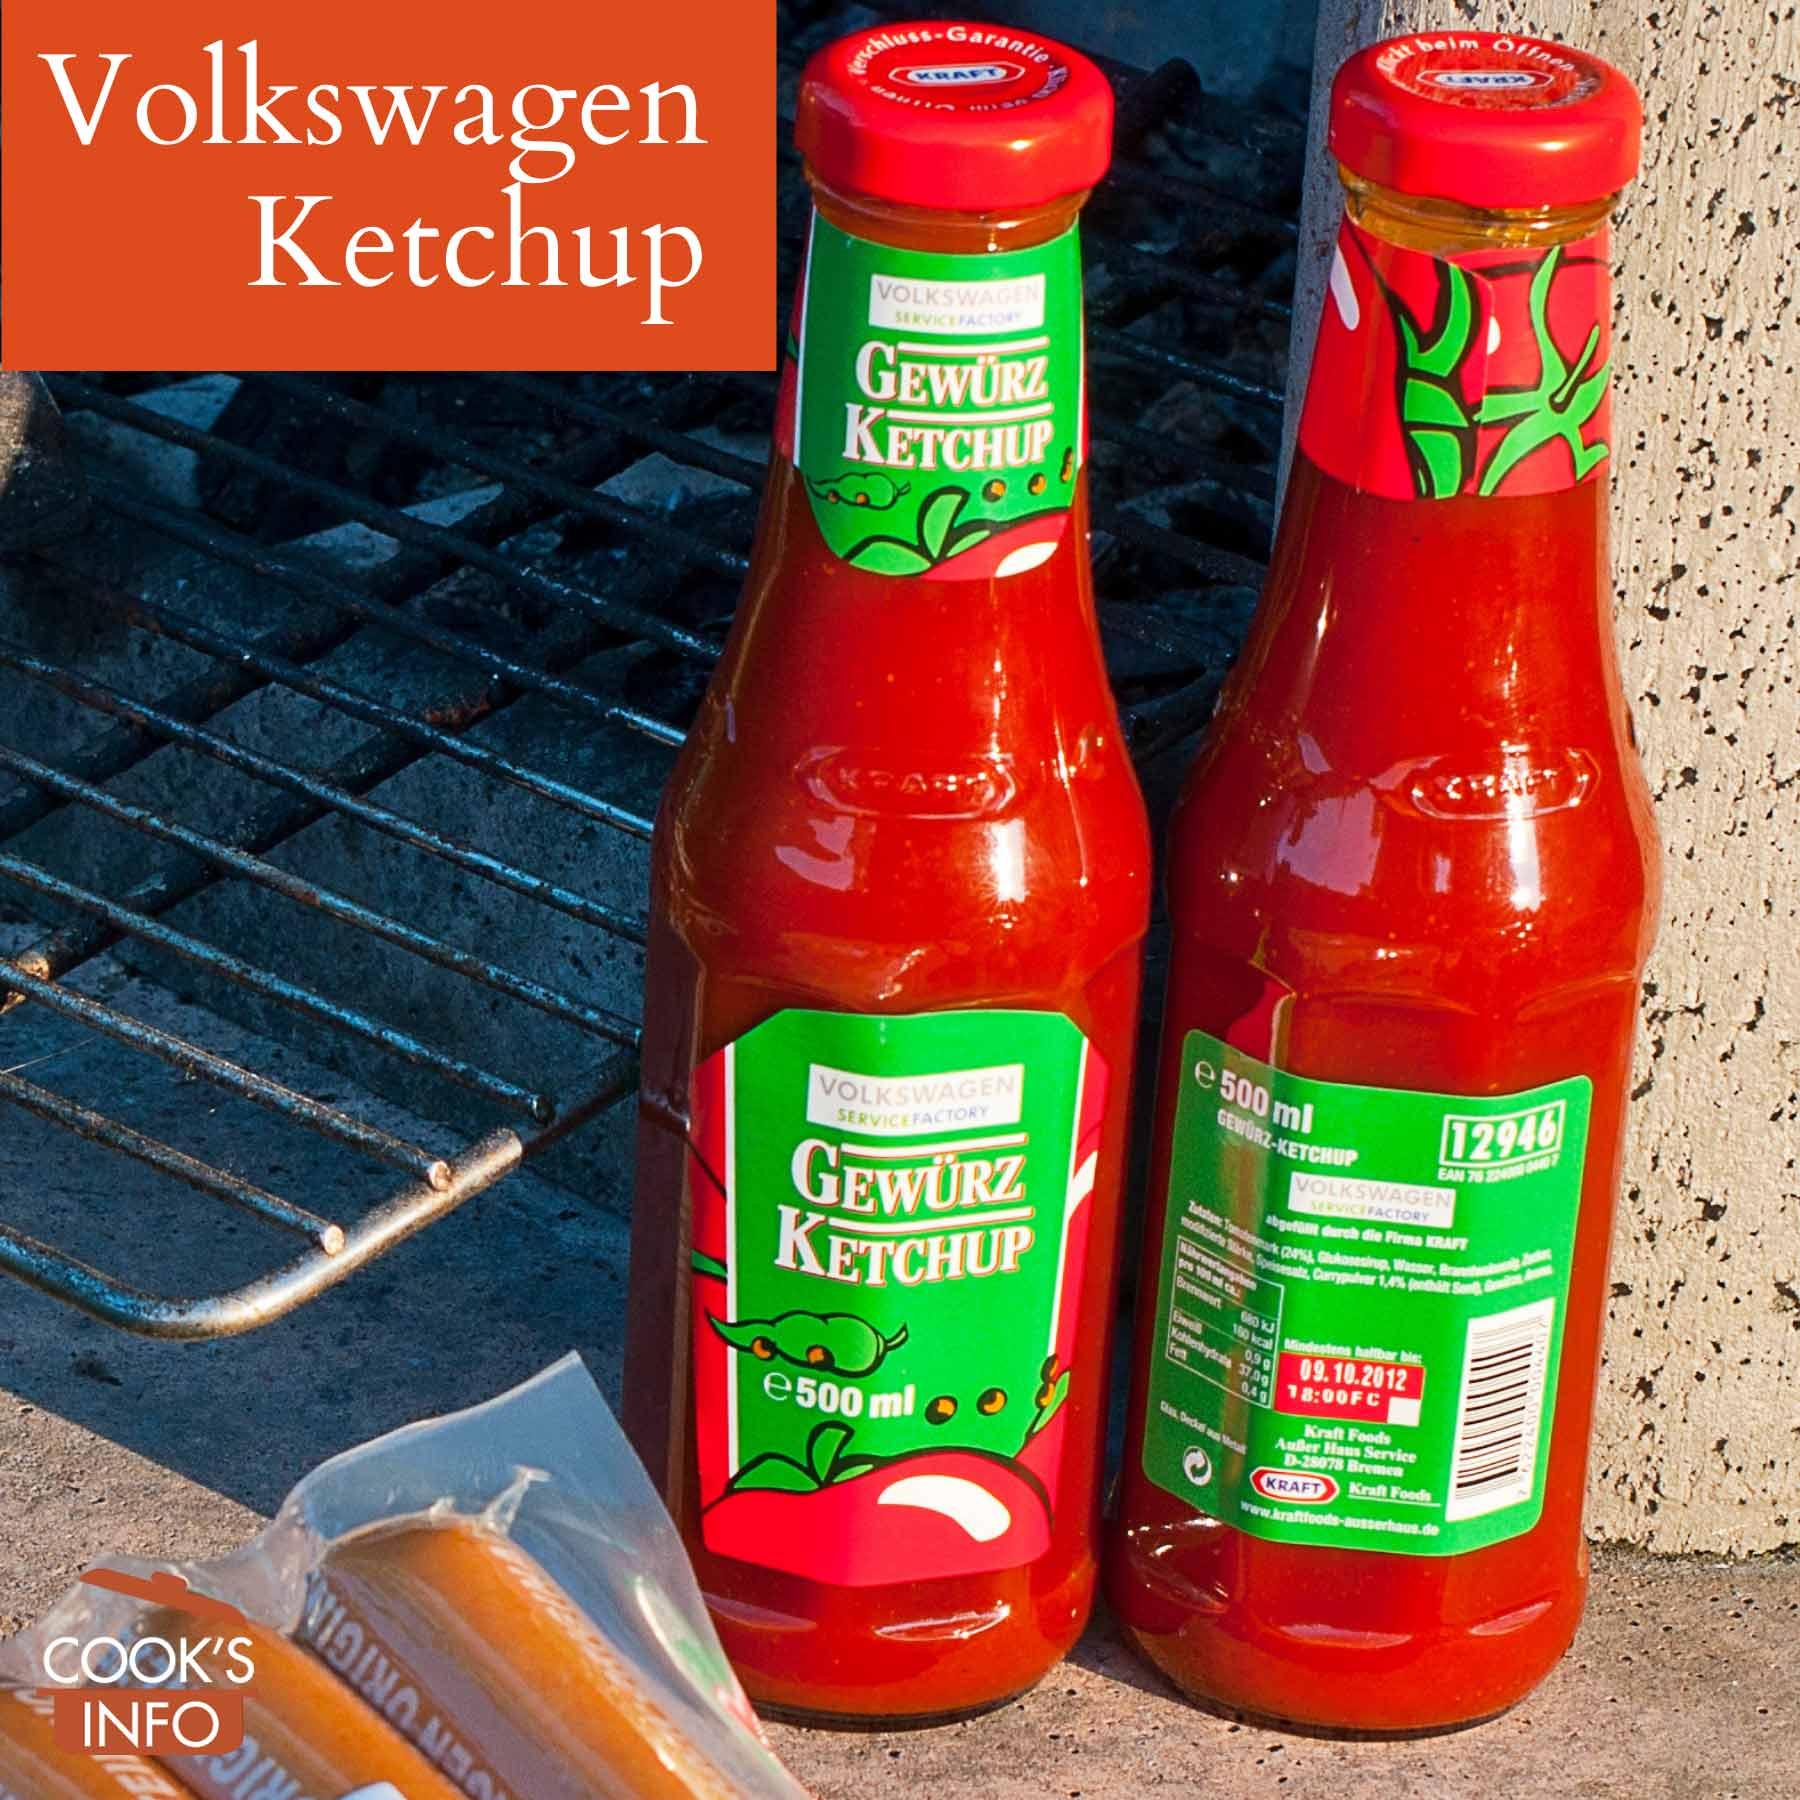 Ketchup from Volkswagen